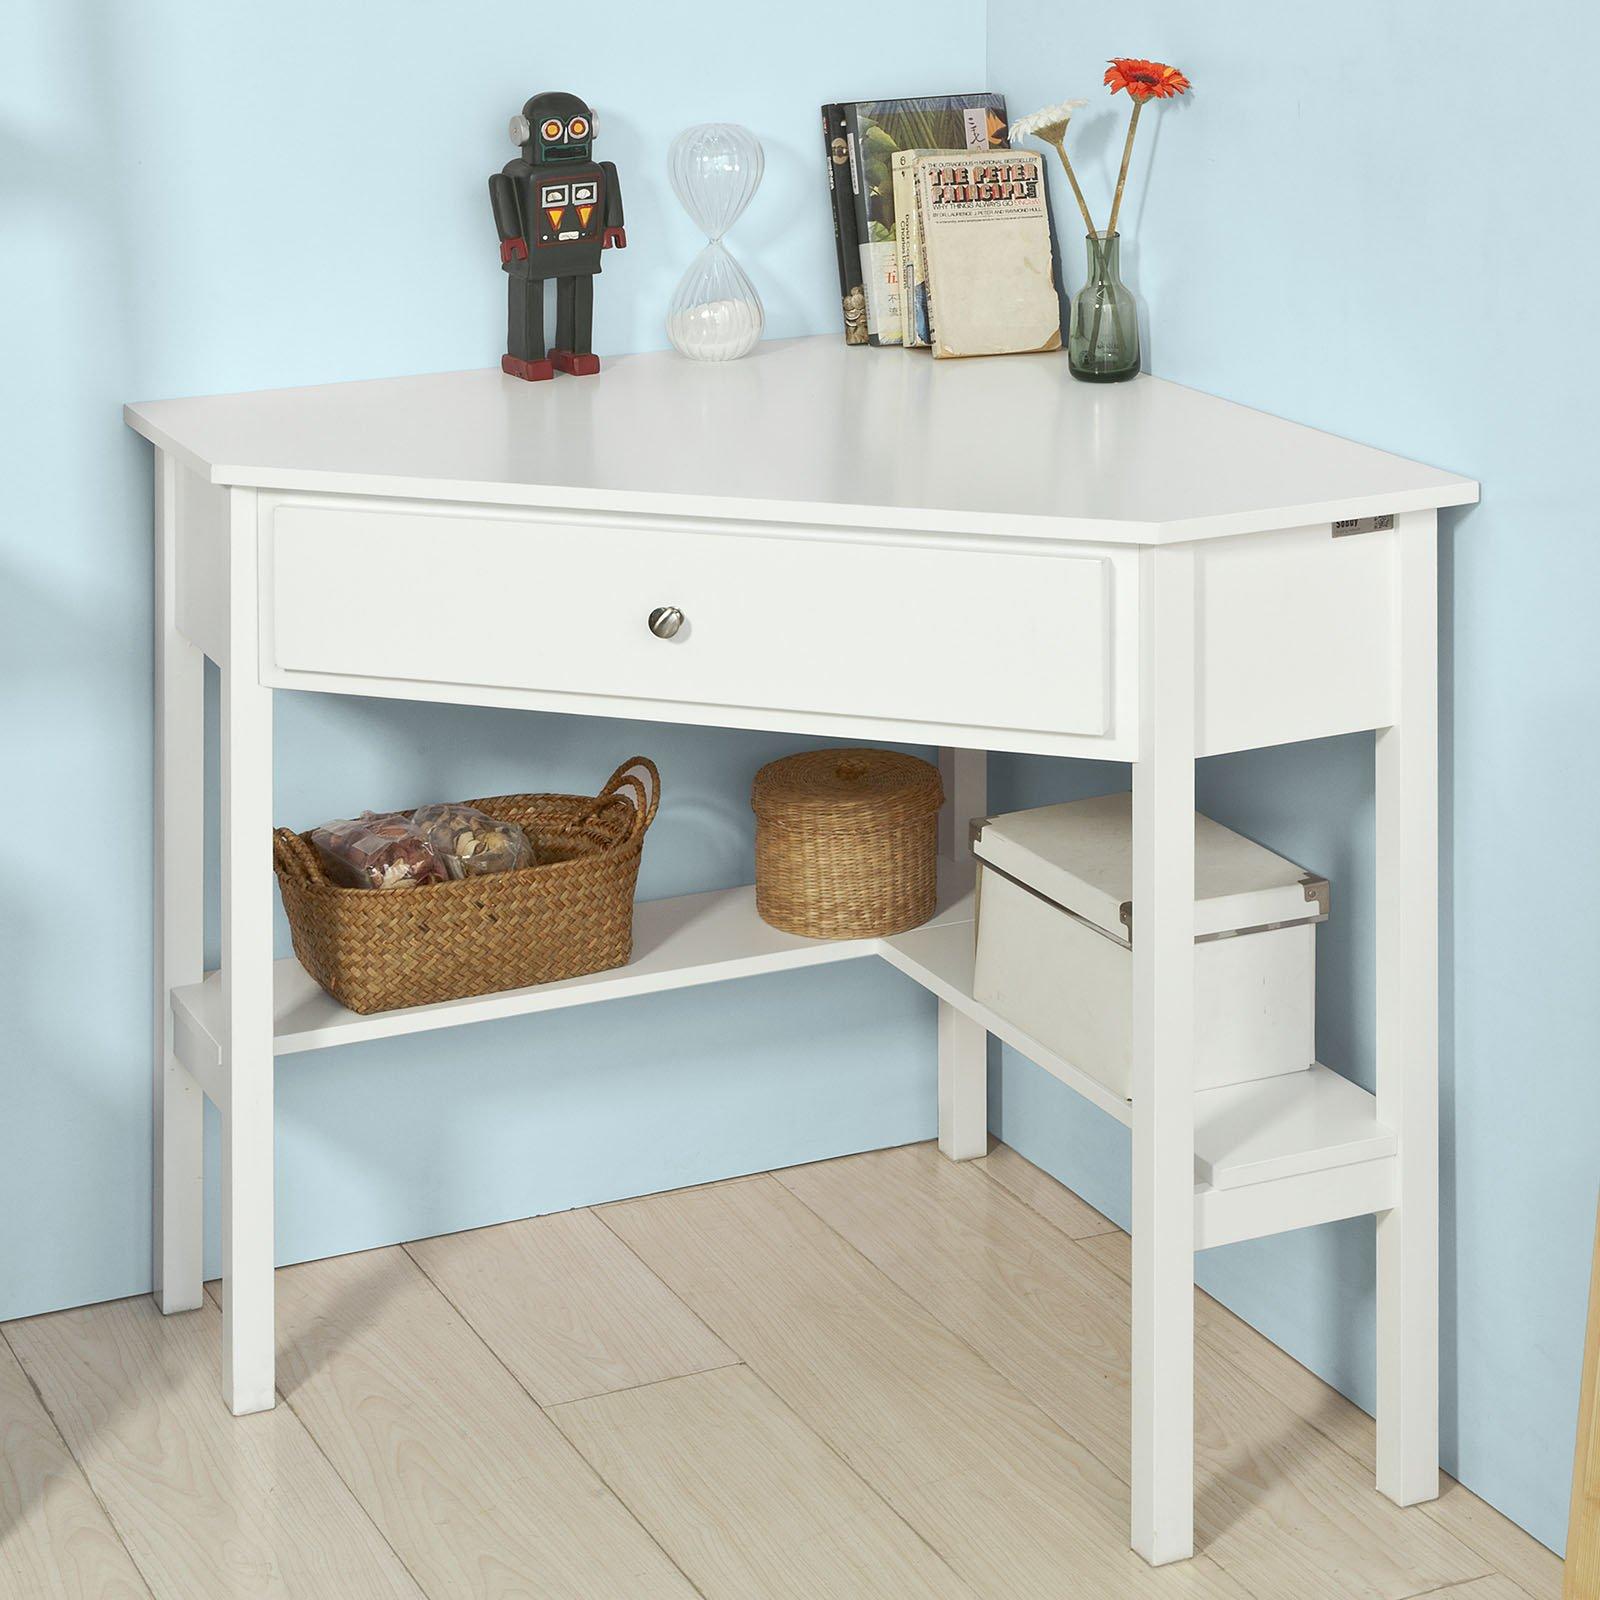 Haotian FWT31-W White Corner Desk, Triangle Table Desk with Drawer and Shelf, Home Office Desk Computer Workstation,Corner Computer Desk